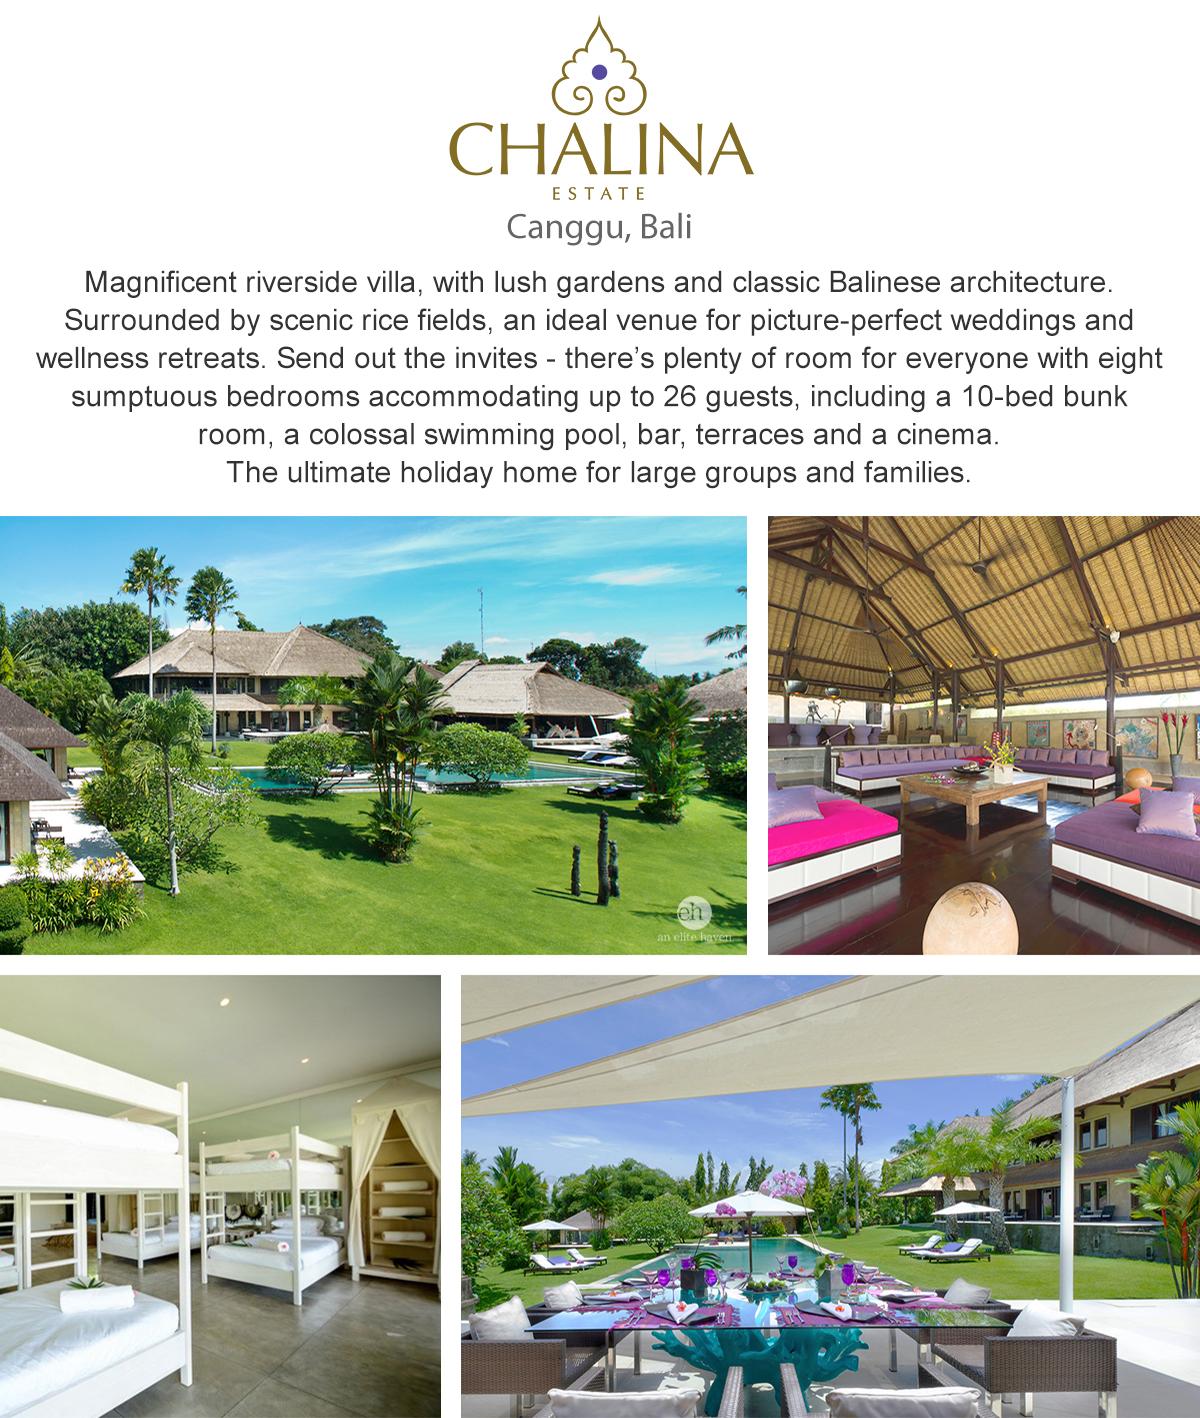 Chalina Estate - Canggu, Bali